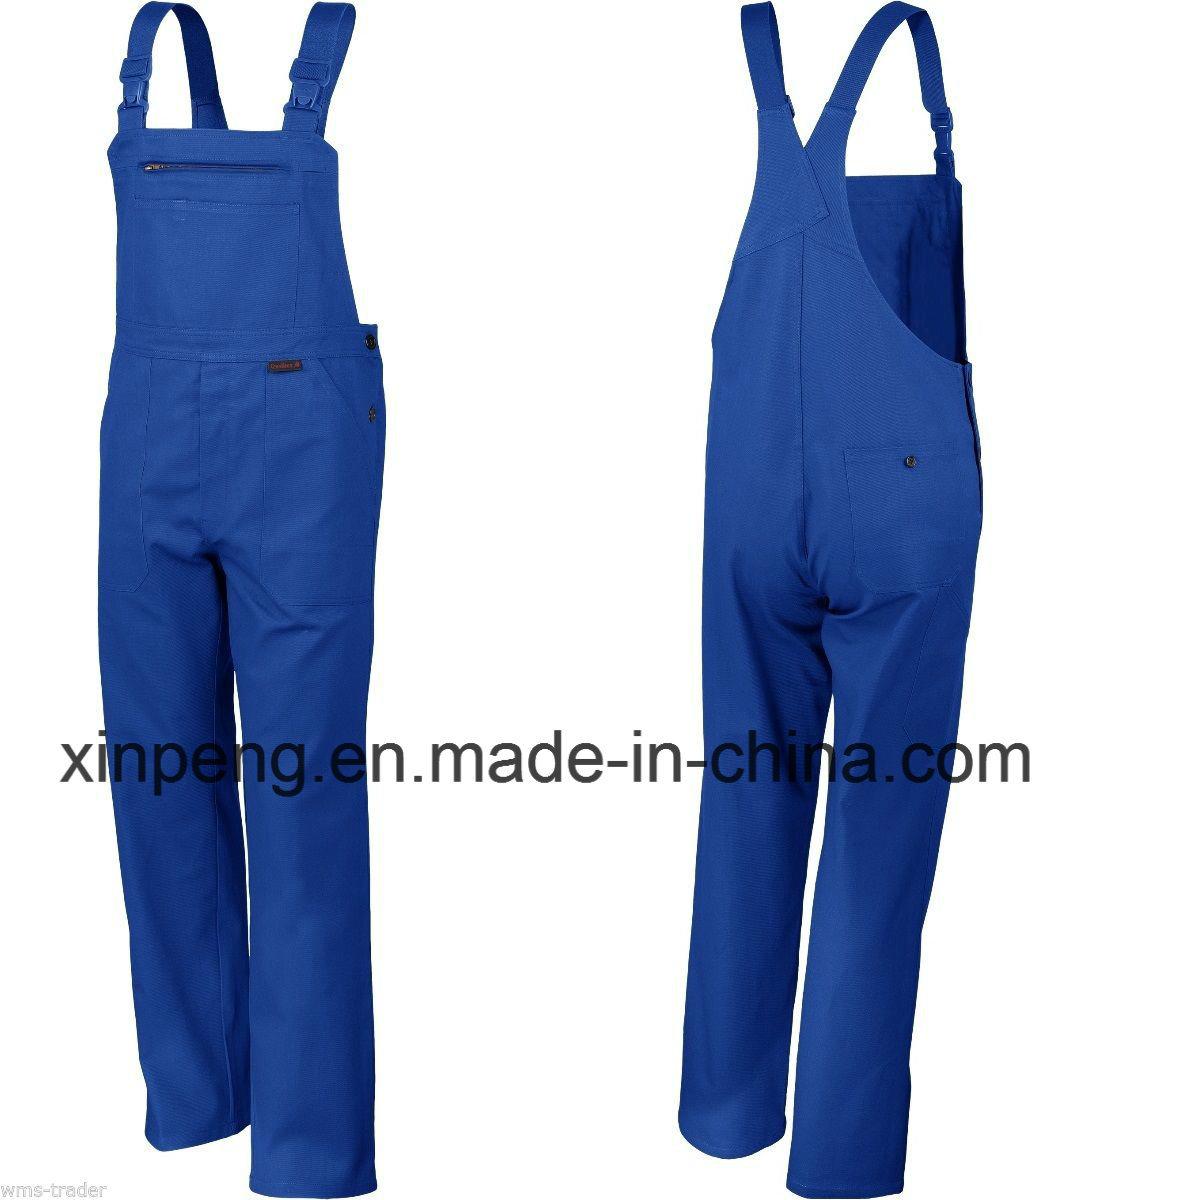 Bib-Pants High Quality Overall Workwear